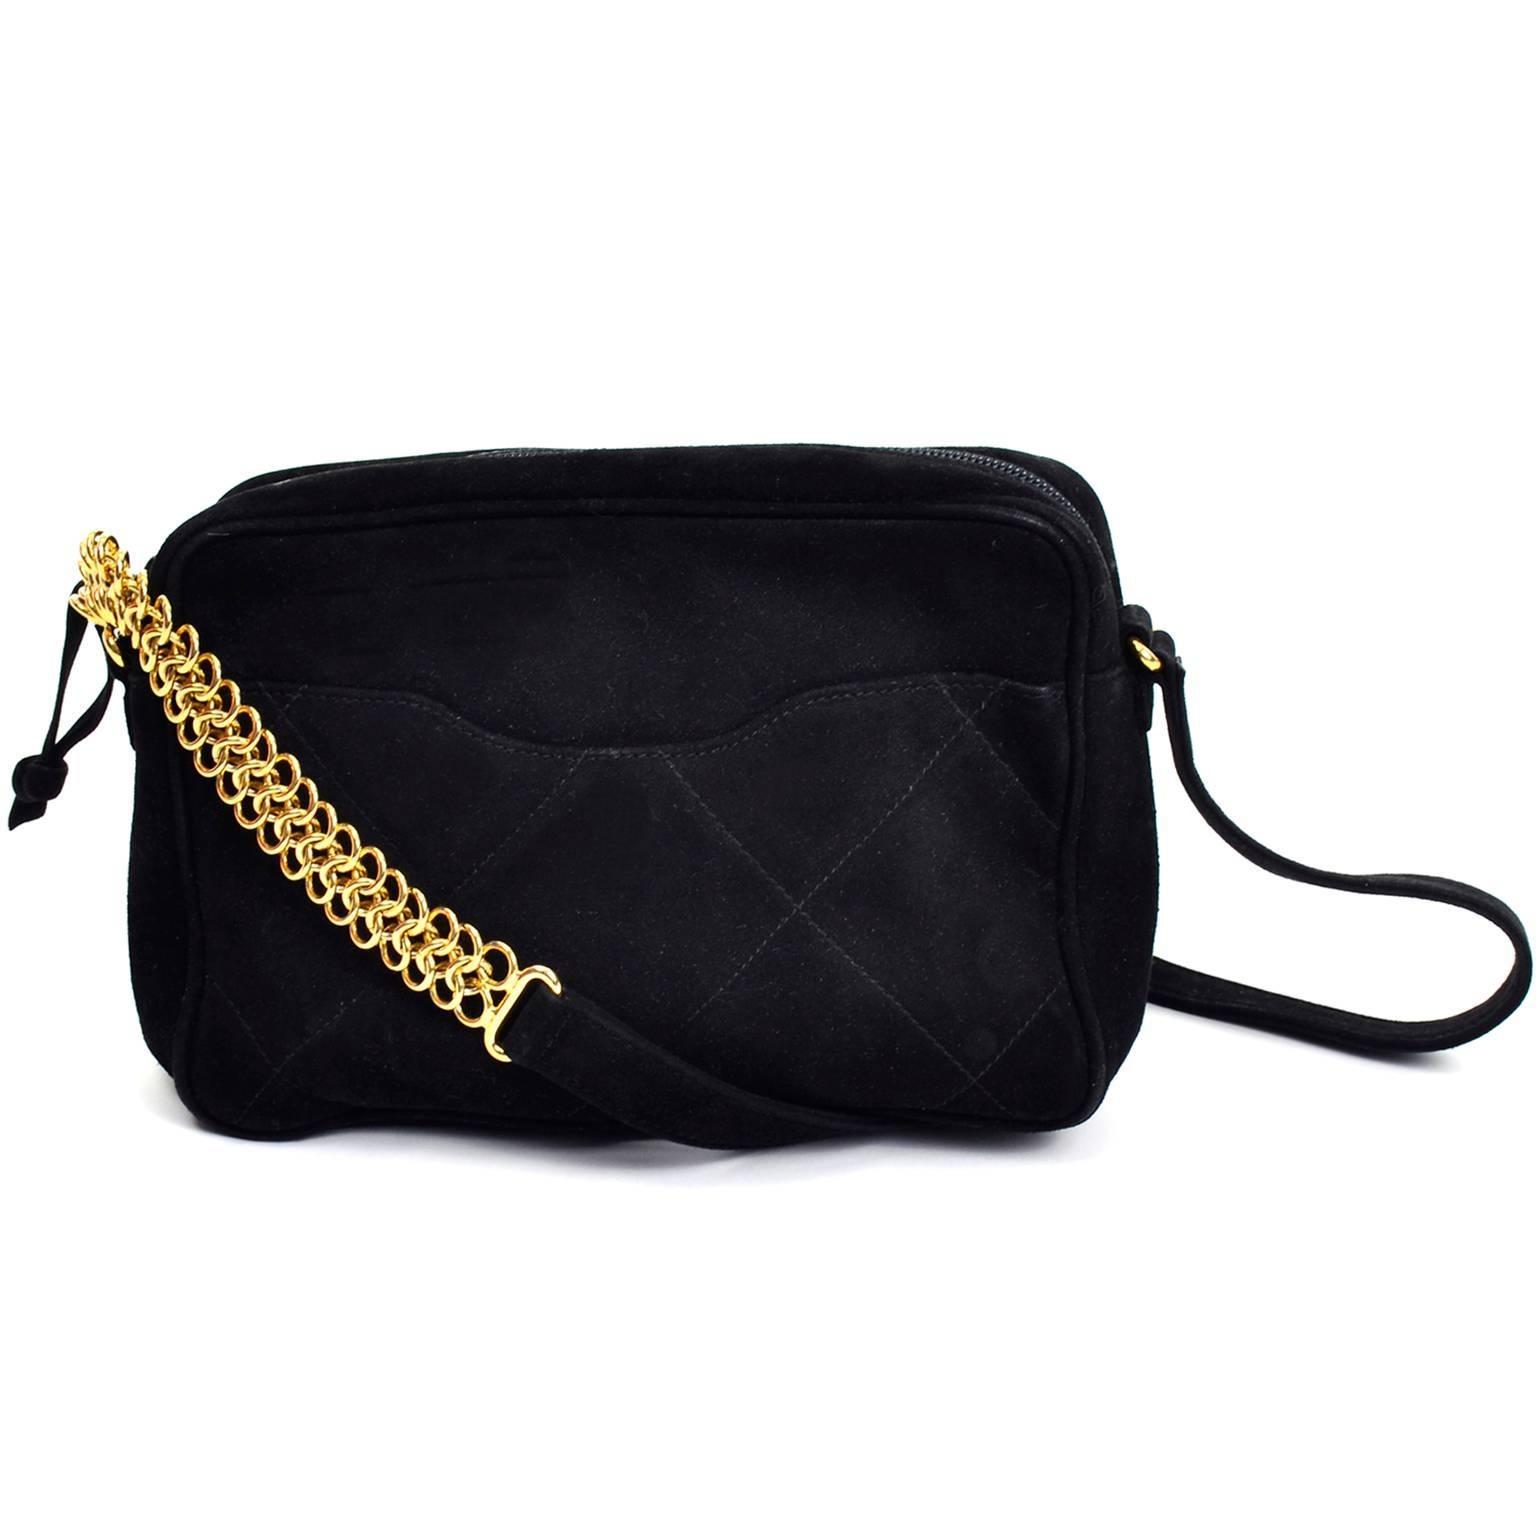 Aquascutum Black Suede Quilted Crossbody Handbag With Gold Chain Link Strap cSSd6sDumn